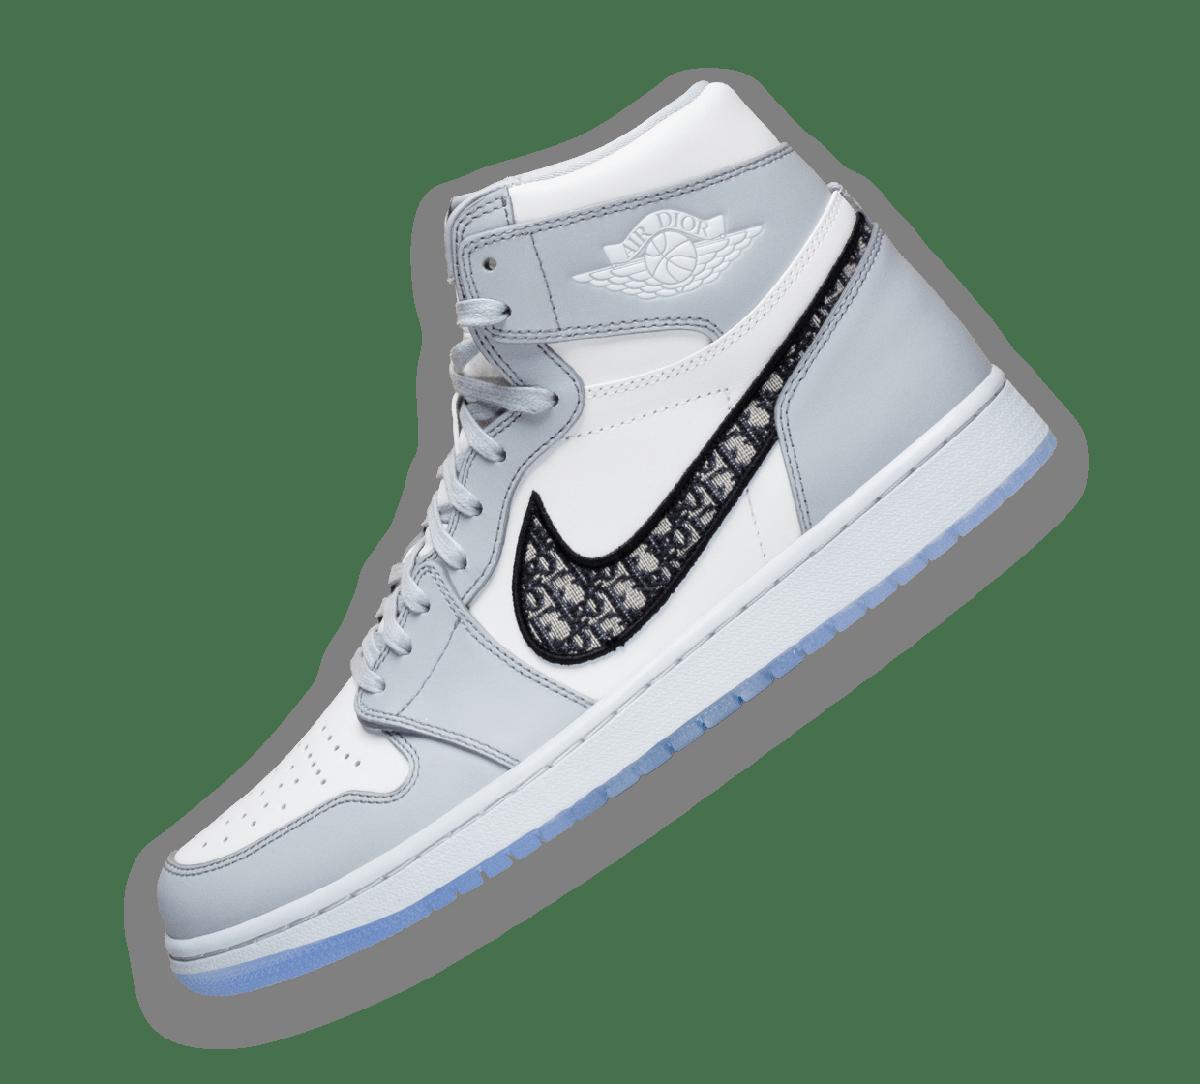 Nike Air Jordan 1 Retro High x Dior Image